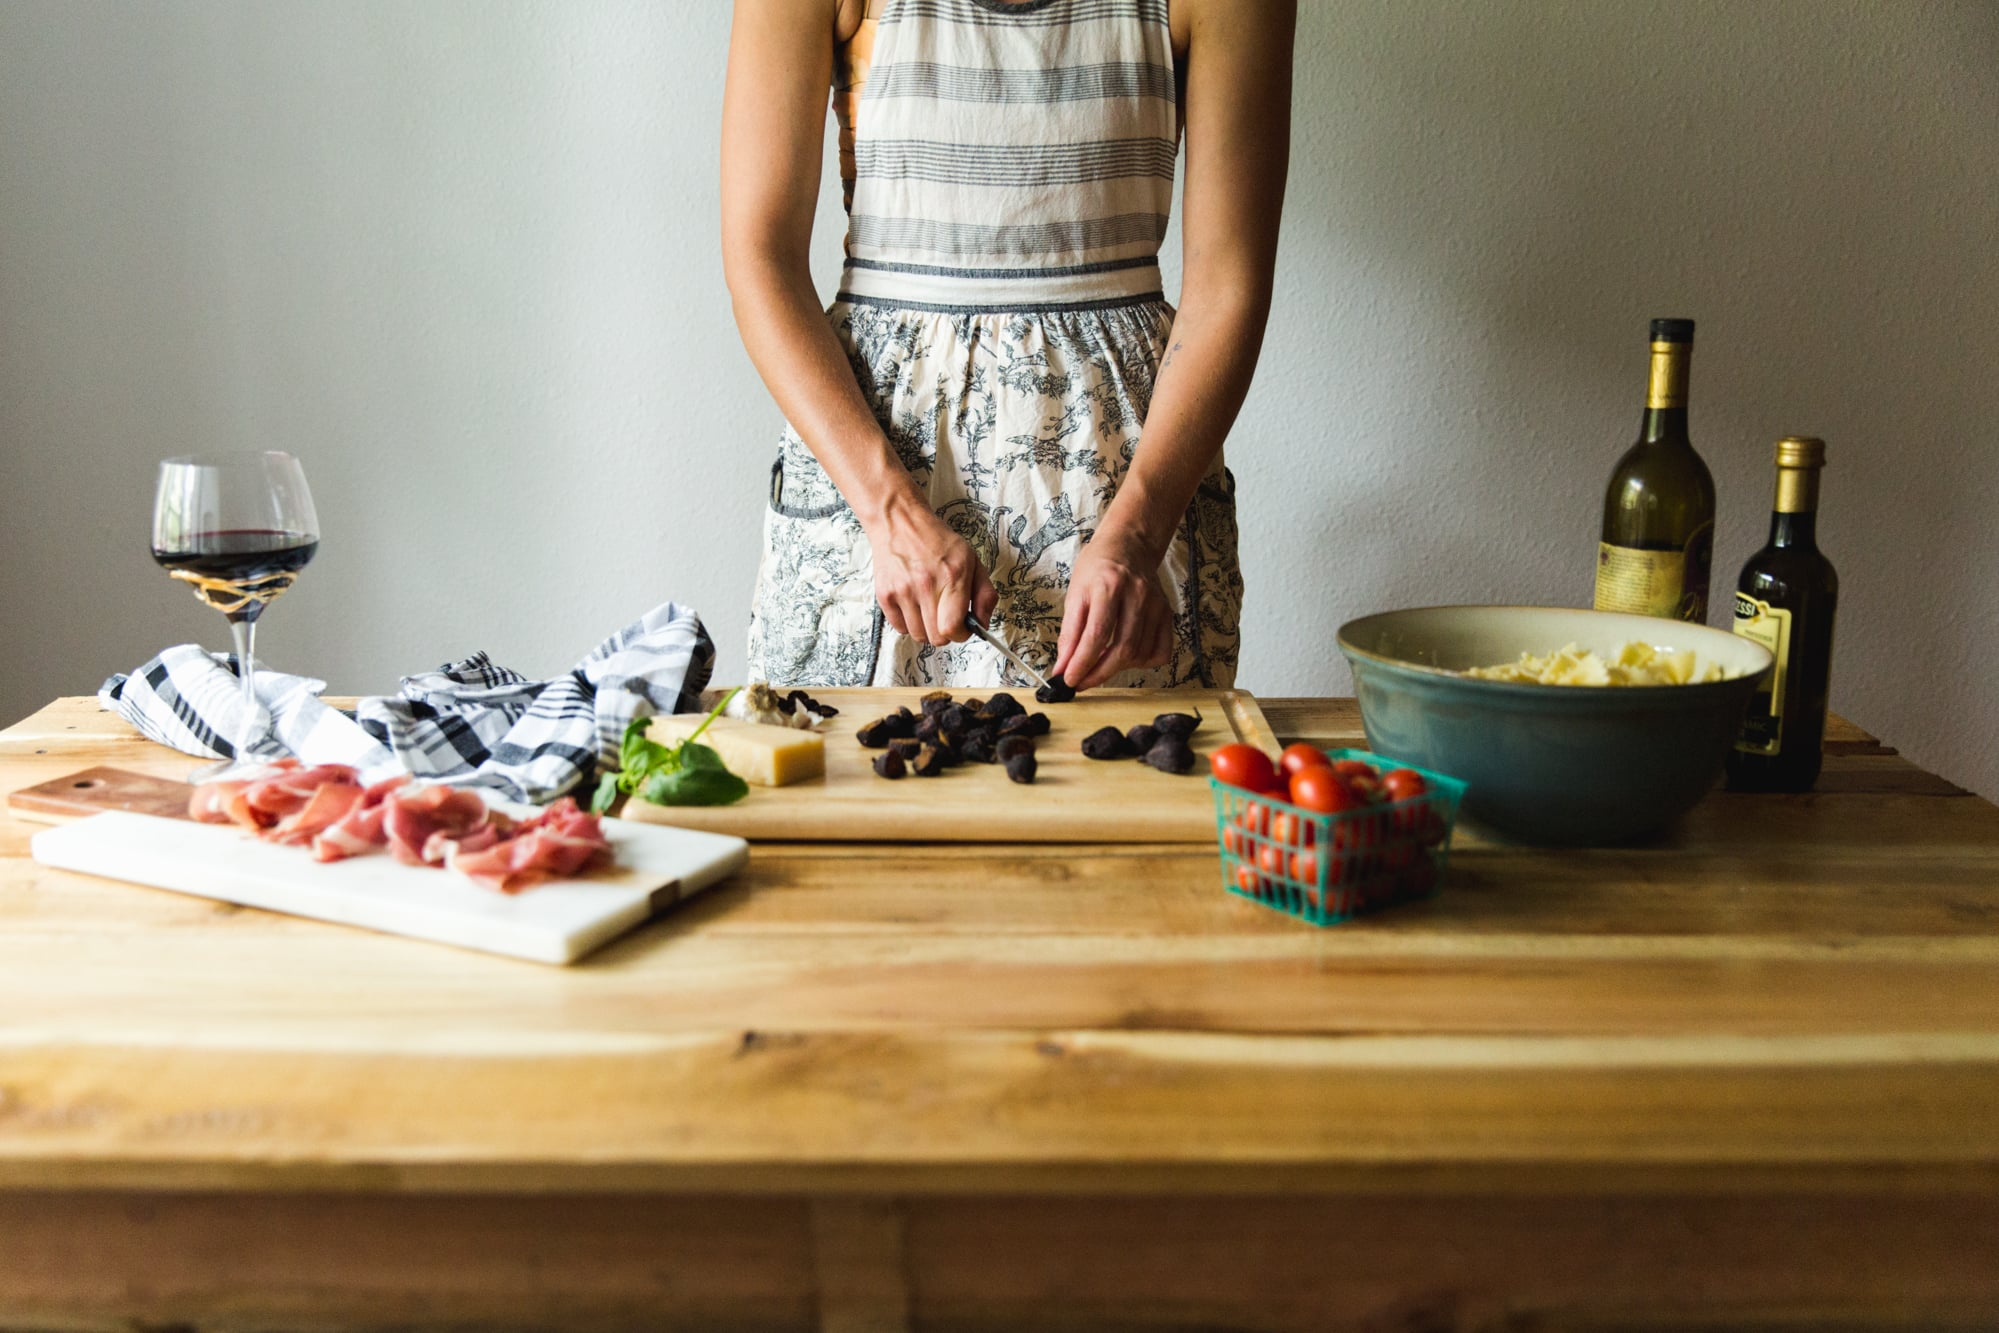 fig-prosciutto-pasta-salad-recipe-4.jpg